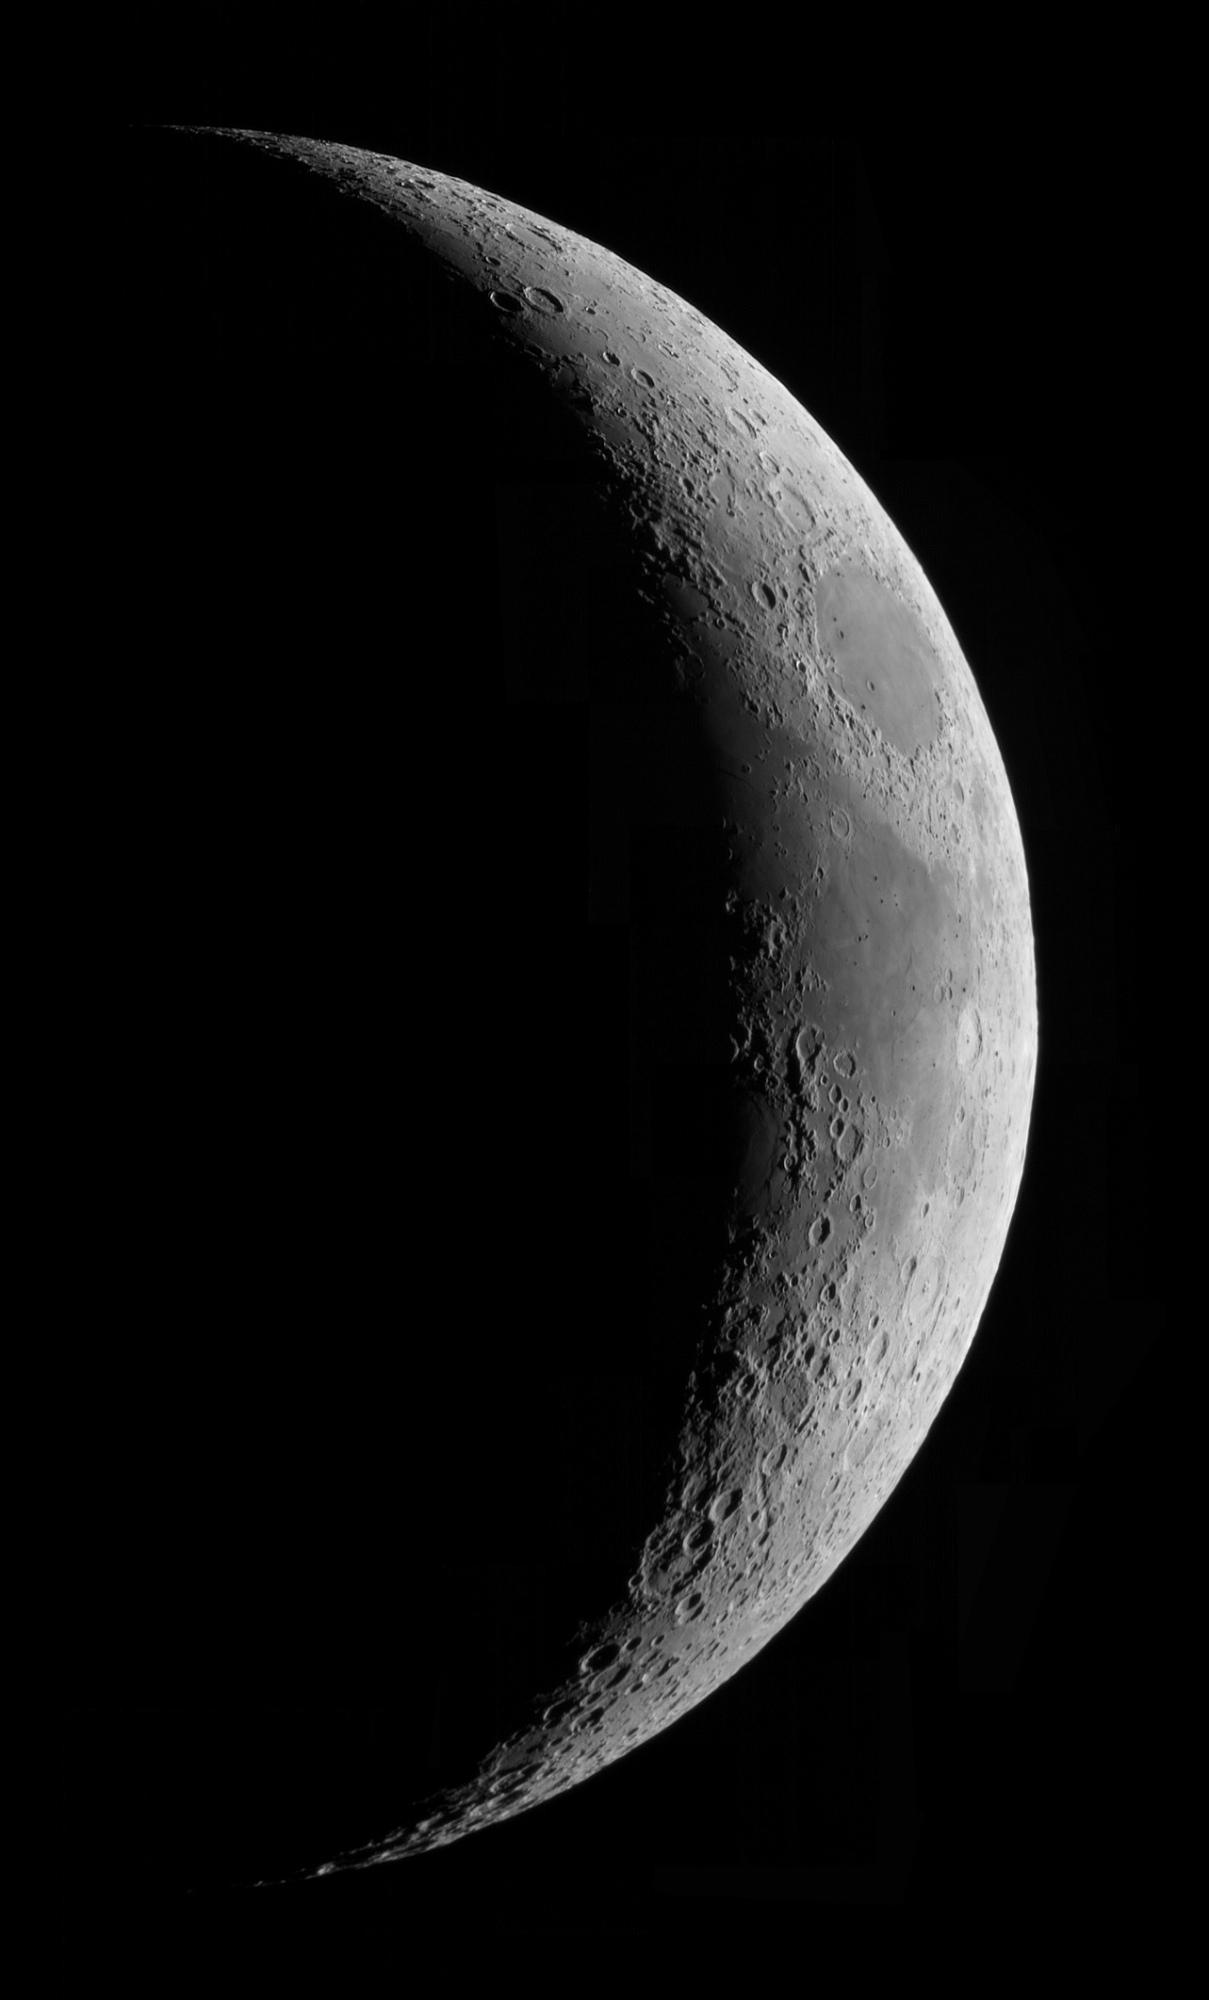 5ed03e576d851_lune260520(40).thumb.jpg.f19a118f0d694100a76328ad358453c1.jpg